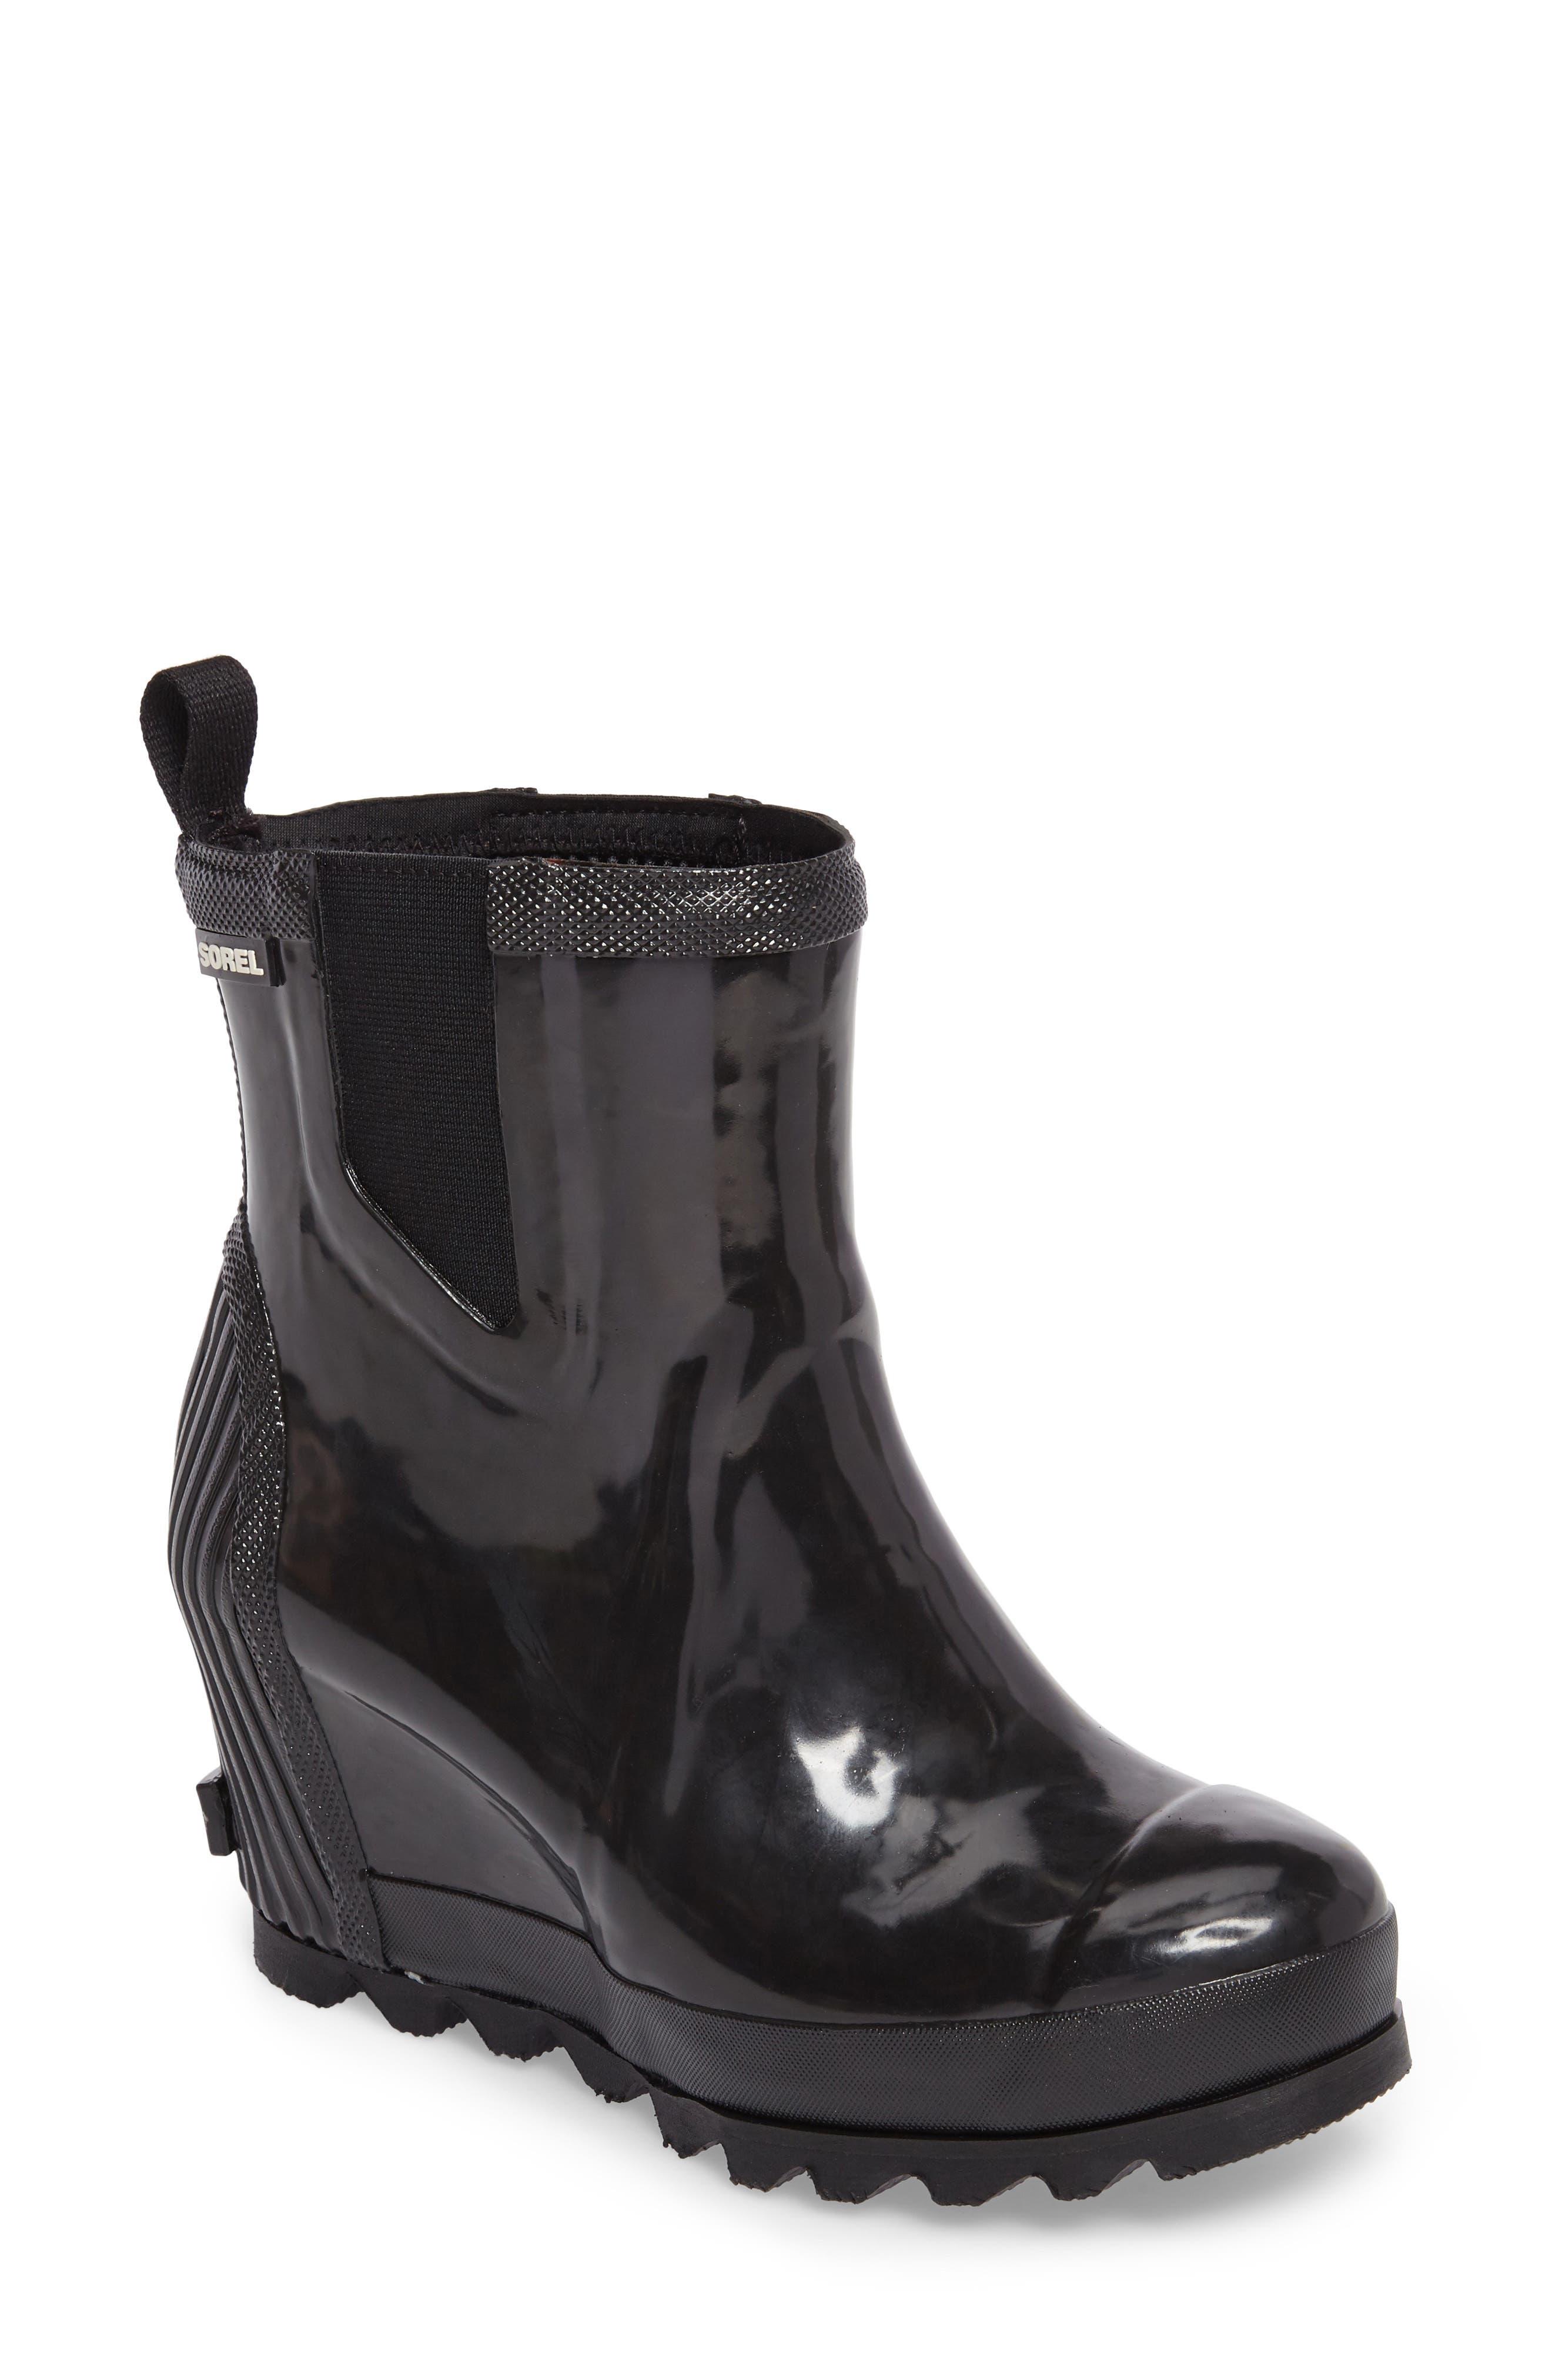 SOREL, Joan Glossy Wedge Waterproof Rain Boot, Main thumbnail 1, color, BLACK/ SEA SALT